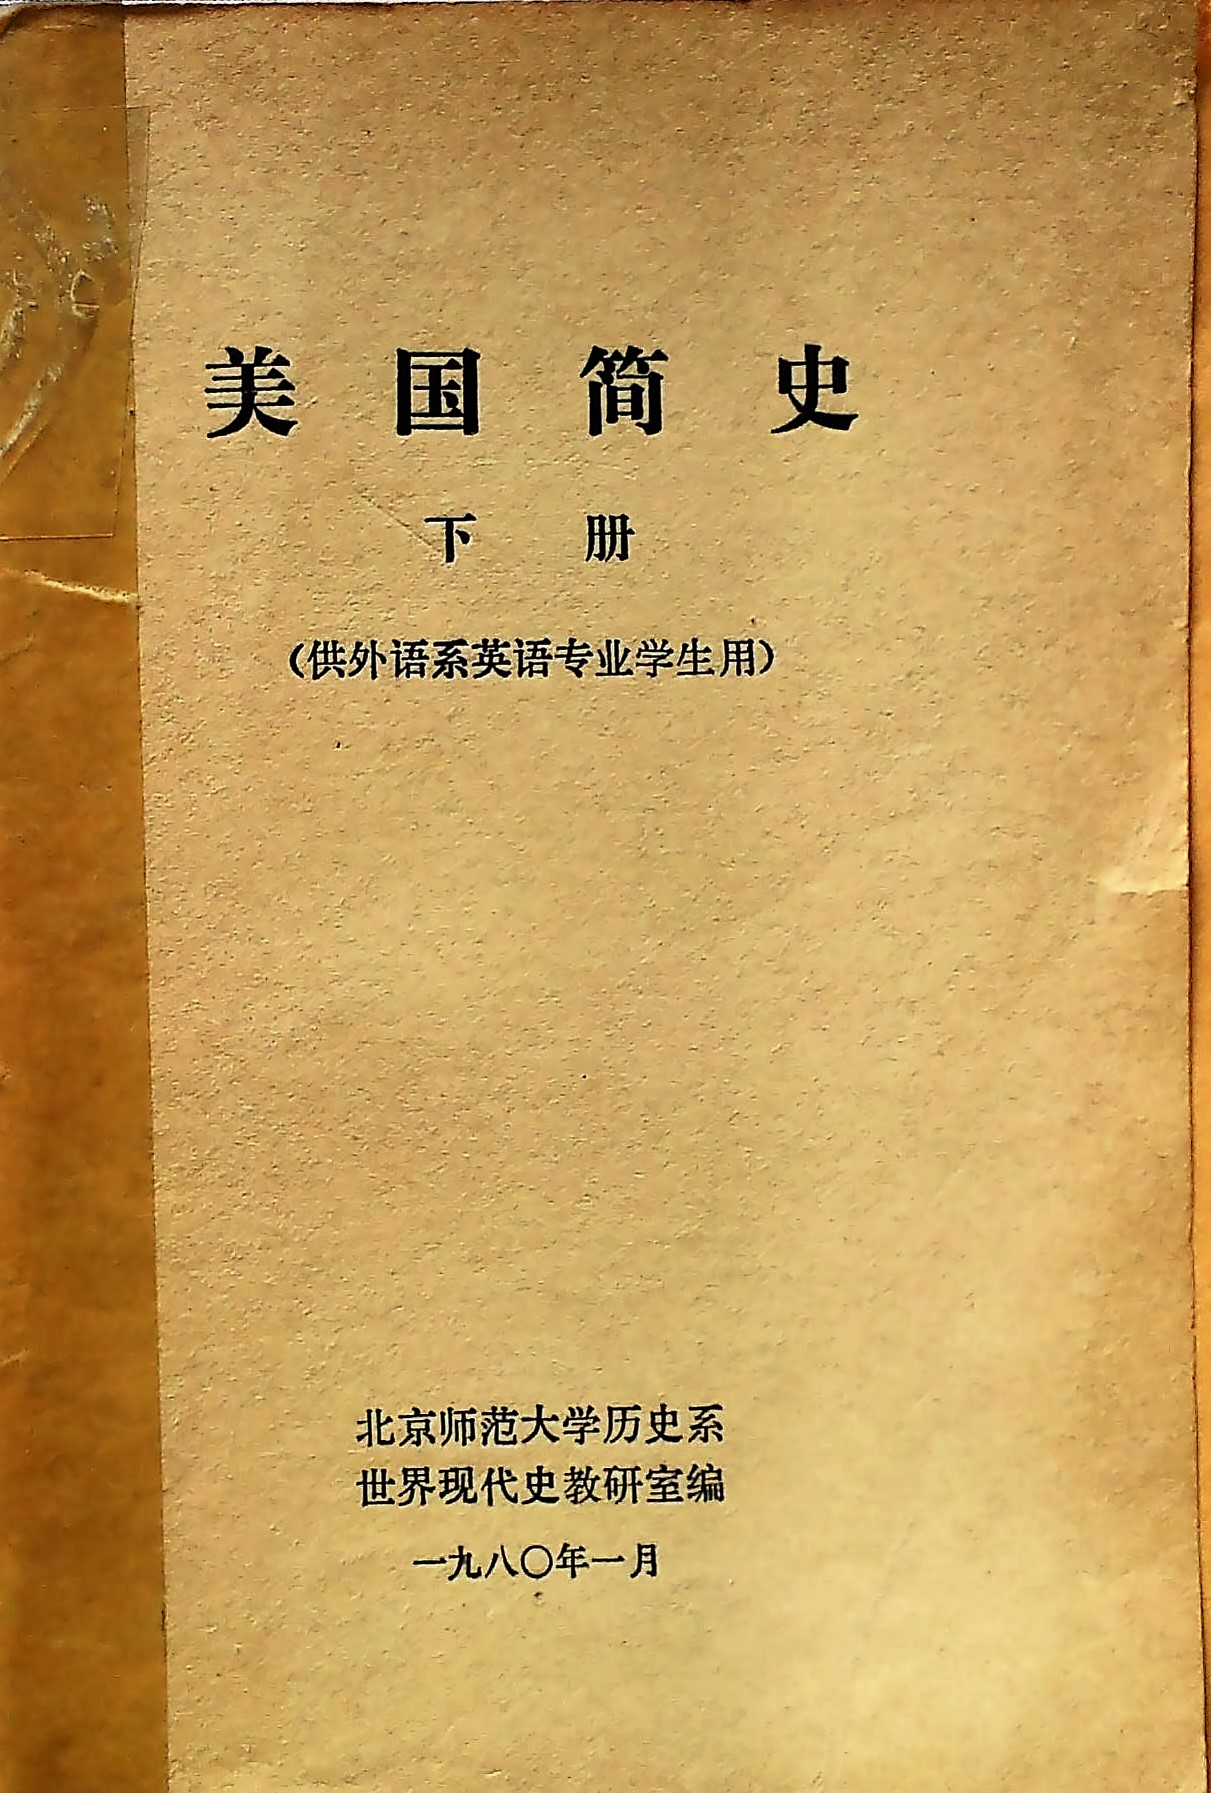 1 IMG186.jpg